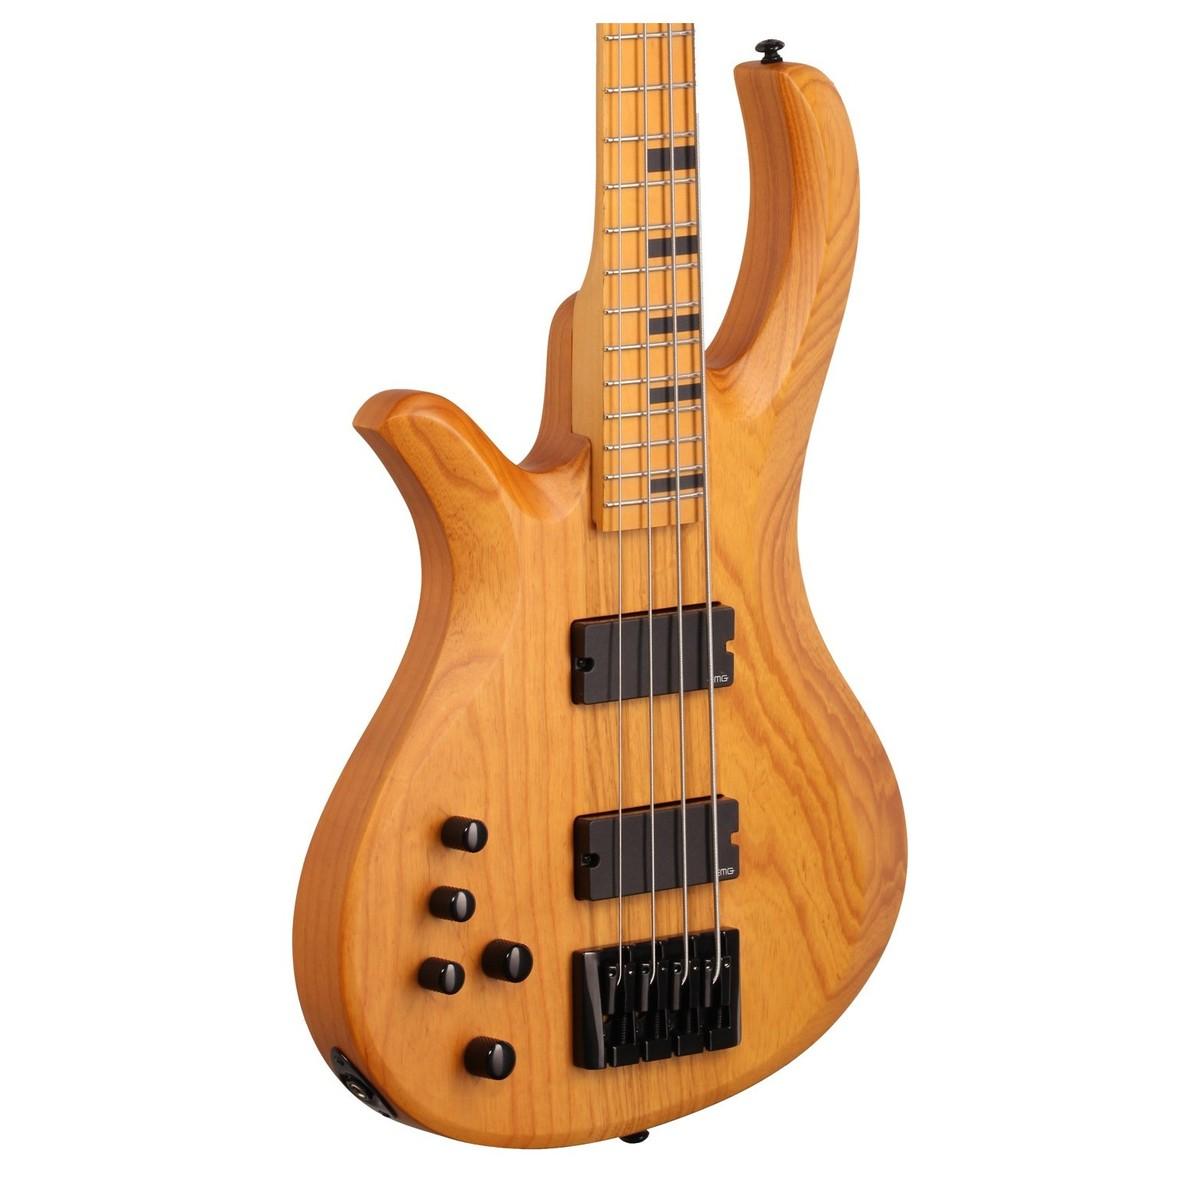 schecter riot session 4 left handed bass guitar aged natural satin at. Black Bedroom Furniture Sets. Home Design Ideas